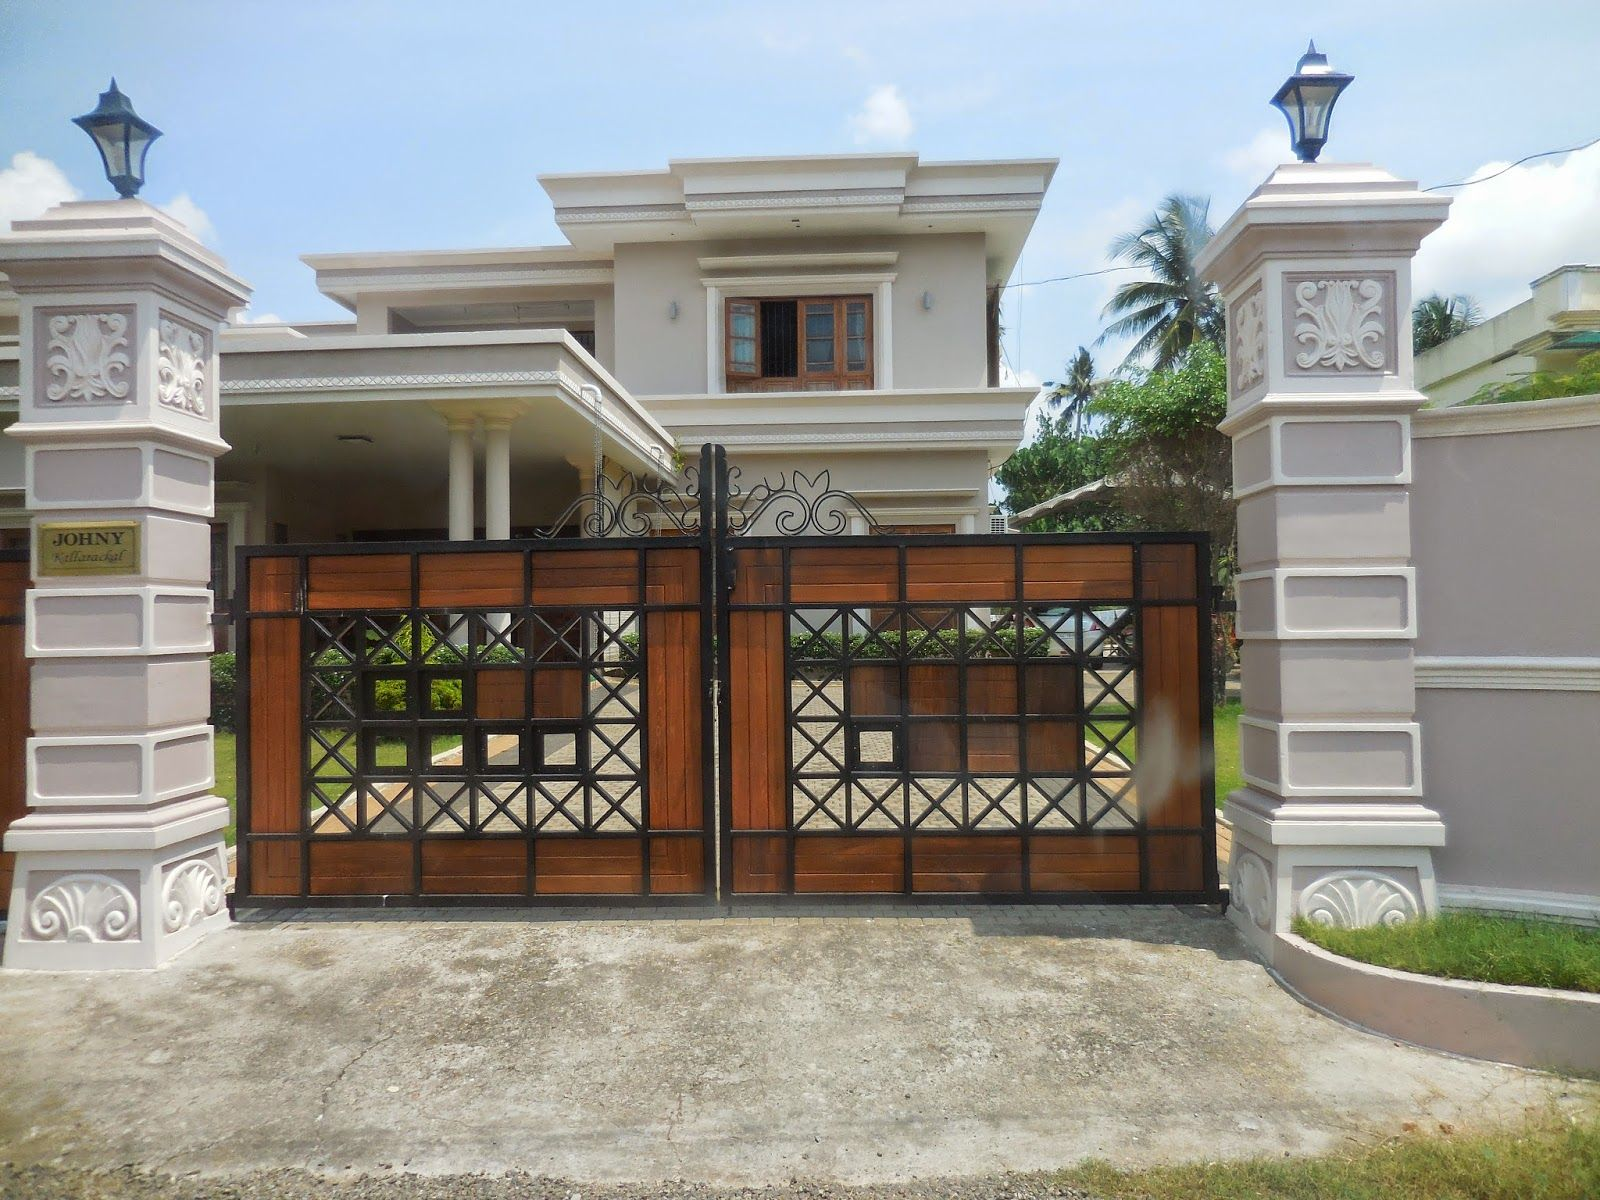 Icymi House Gate Photos Kerala Casas In 2019 House Gate